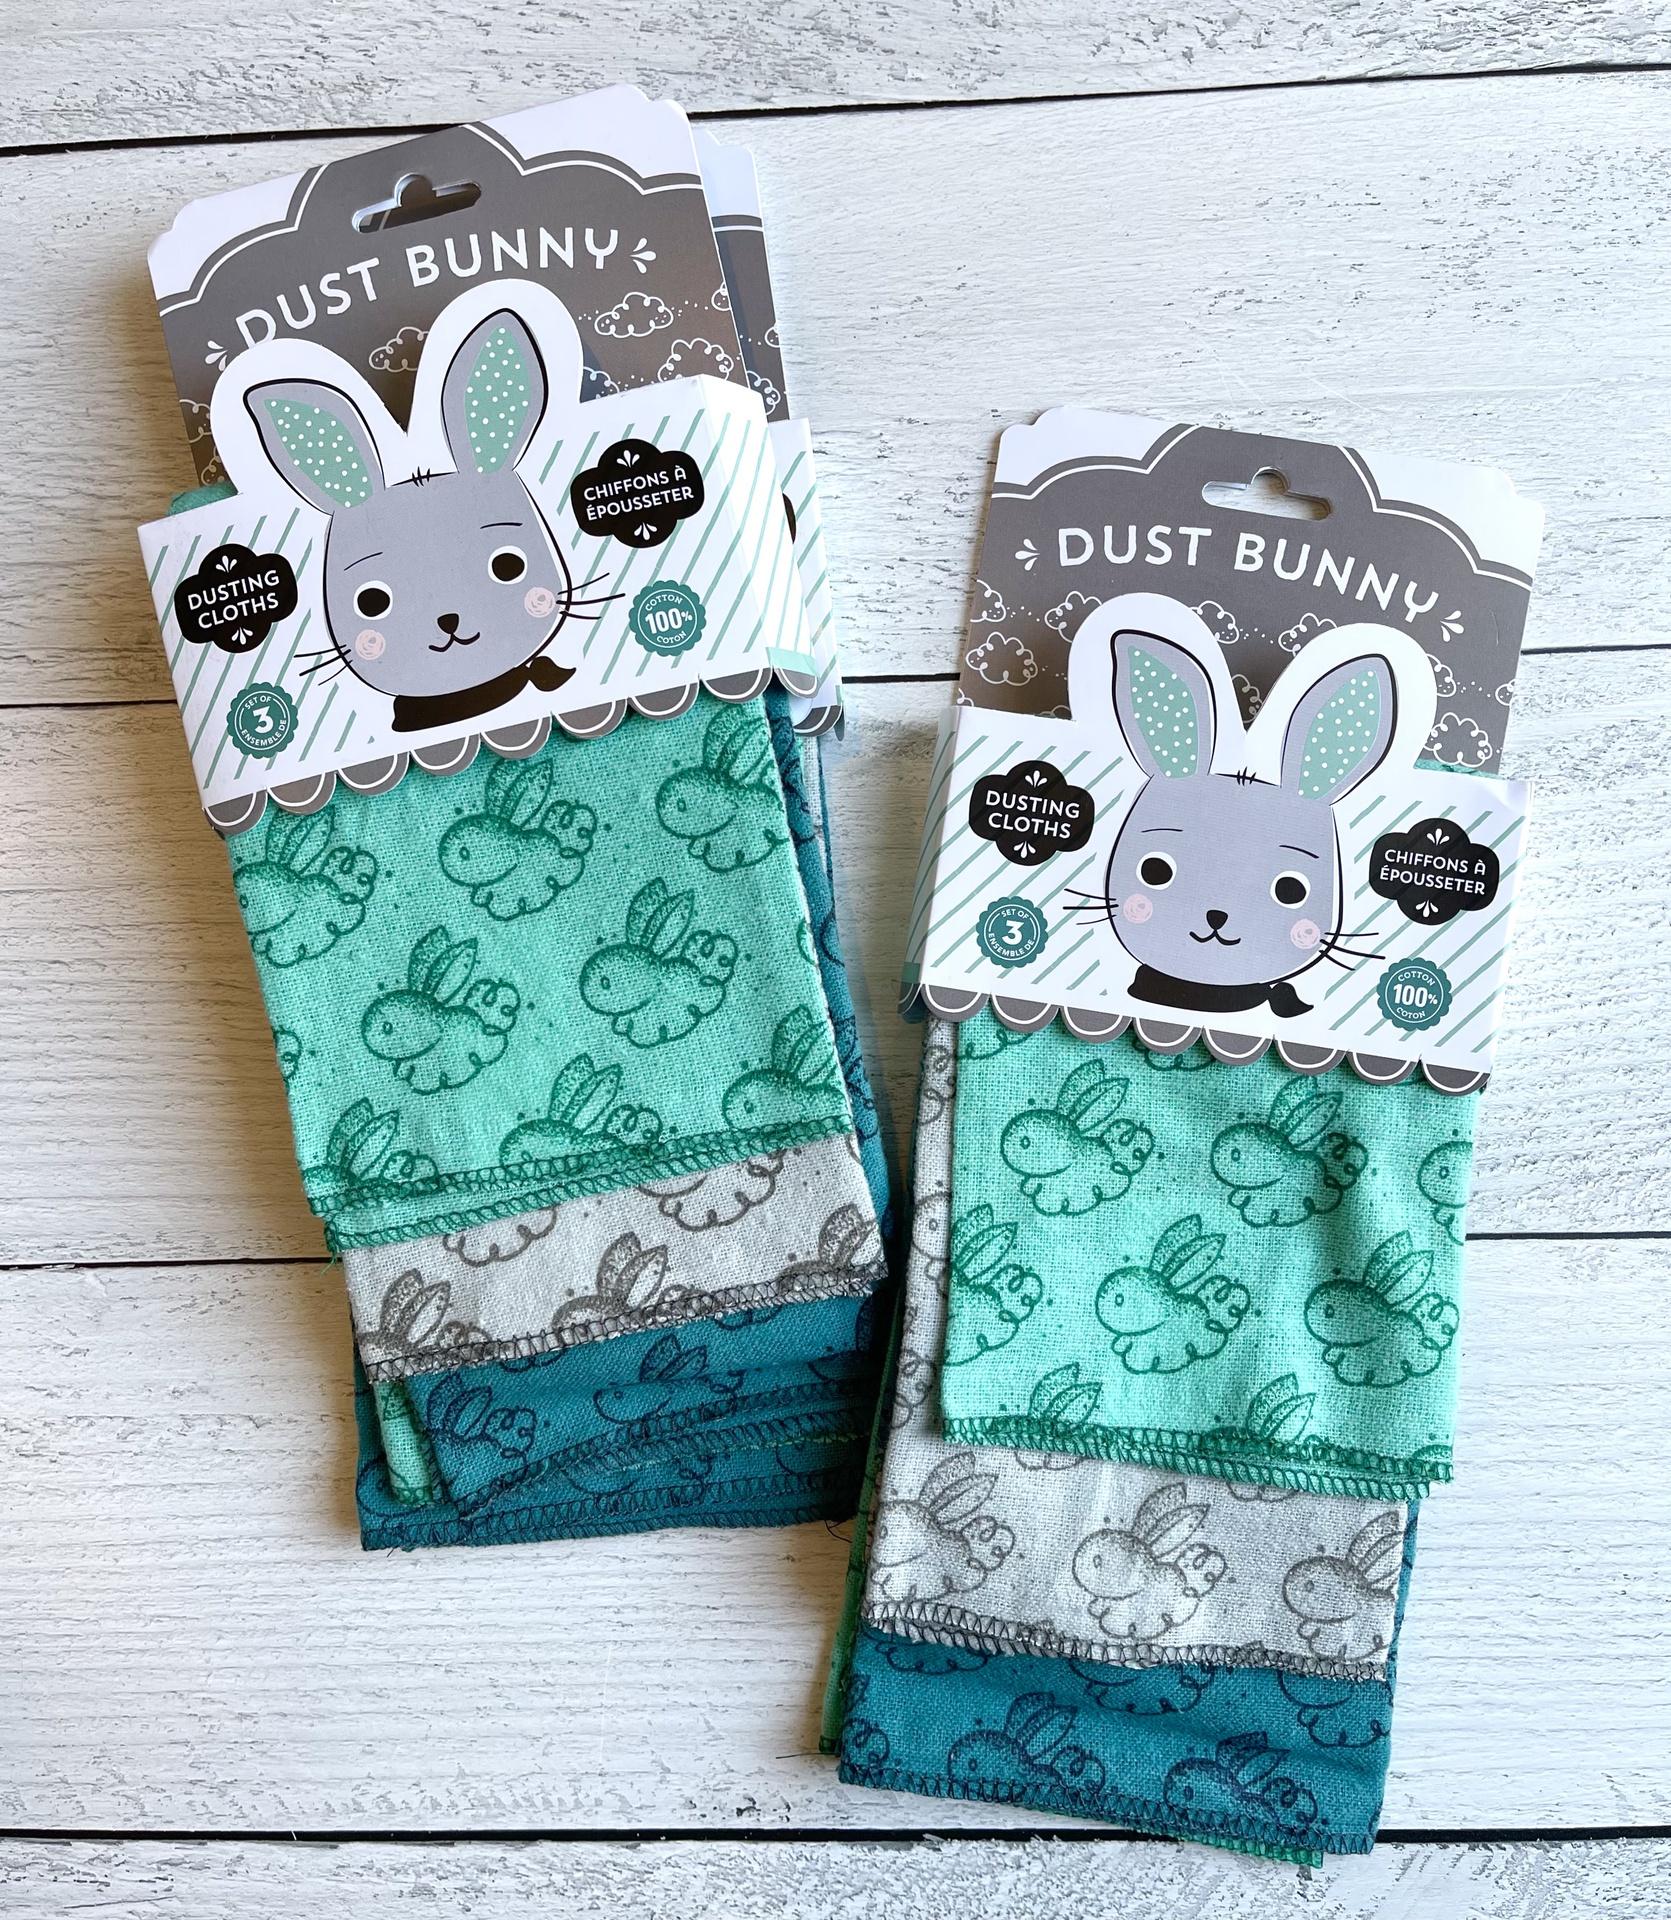 Dust Bunny Dusting Cloth Set/3